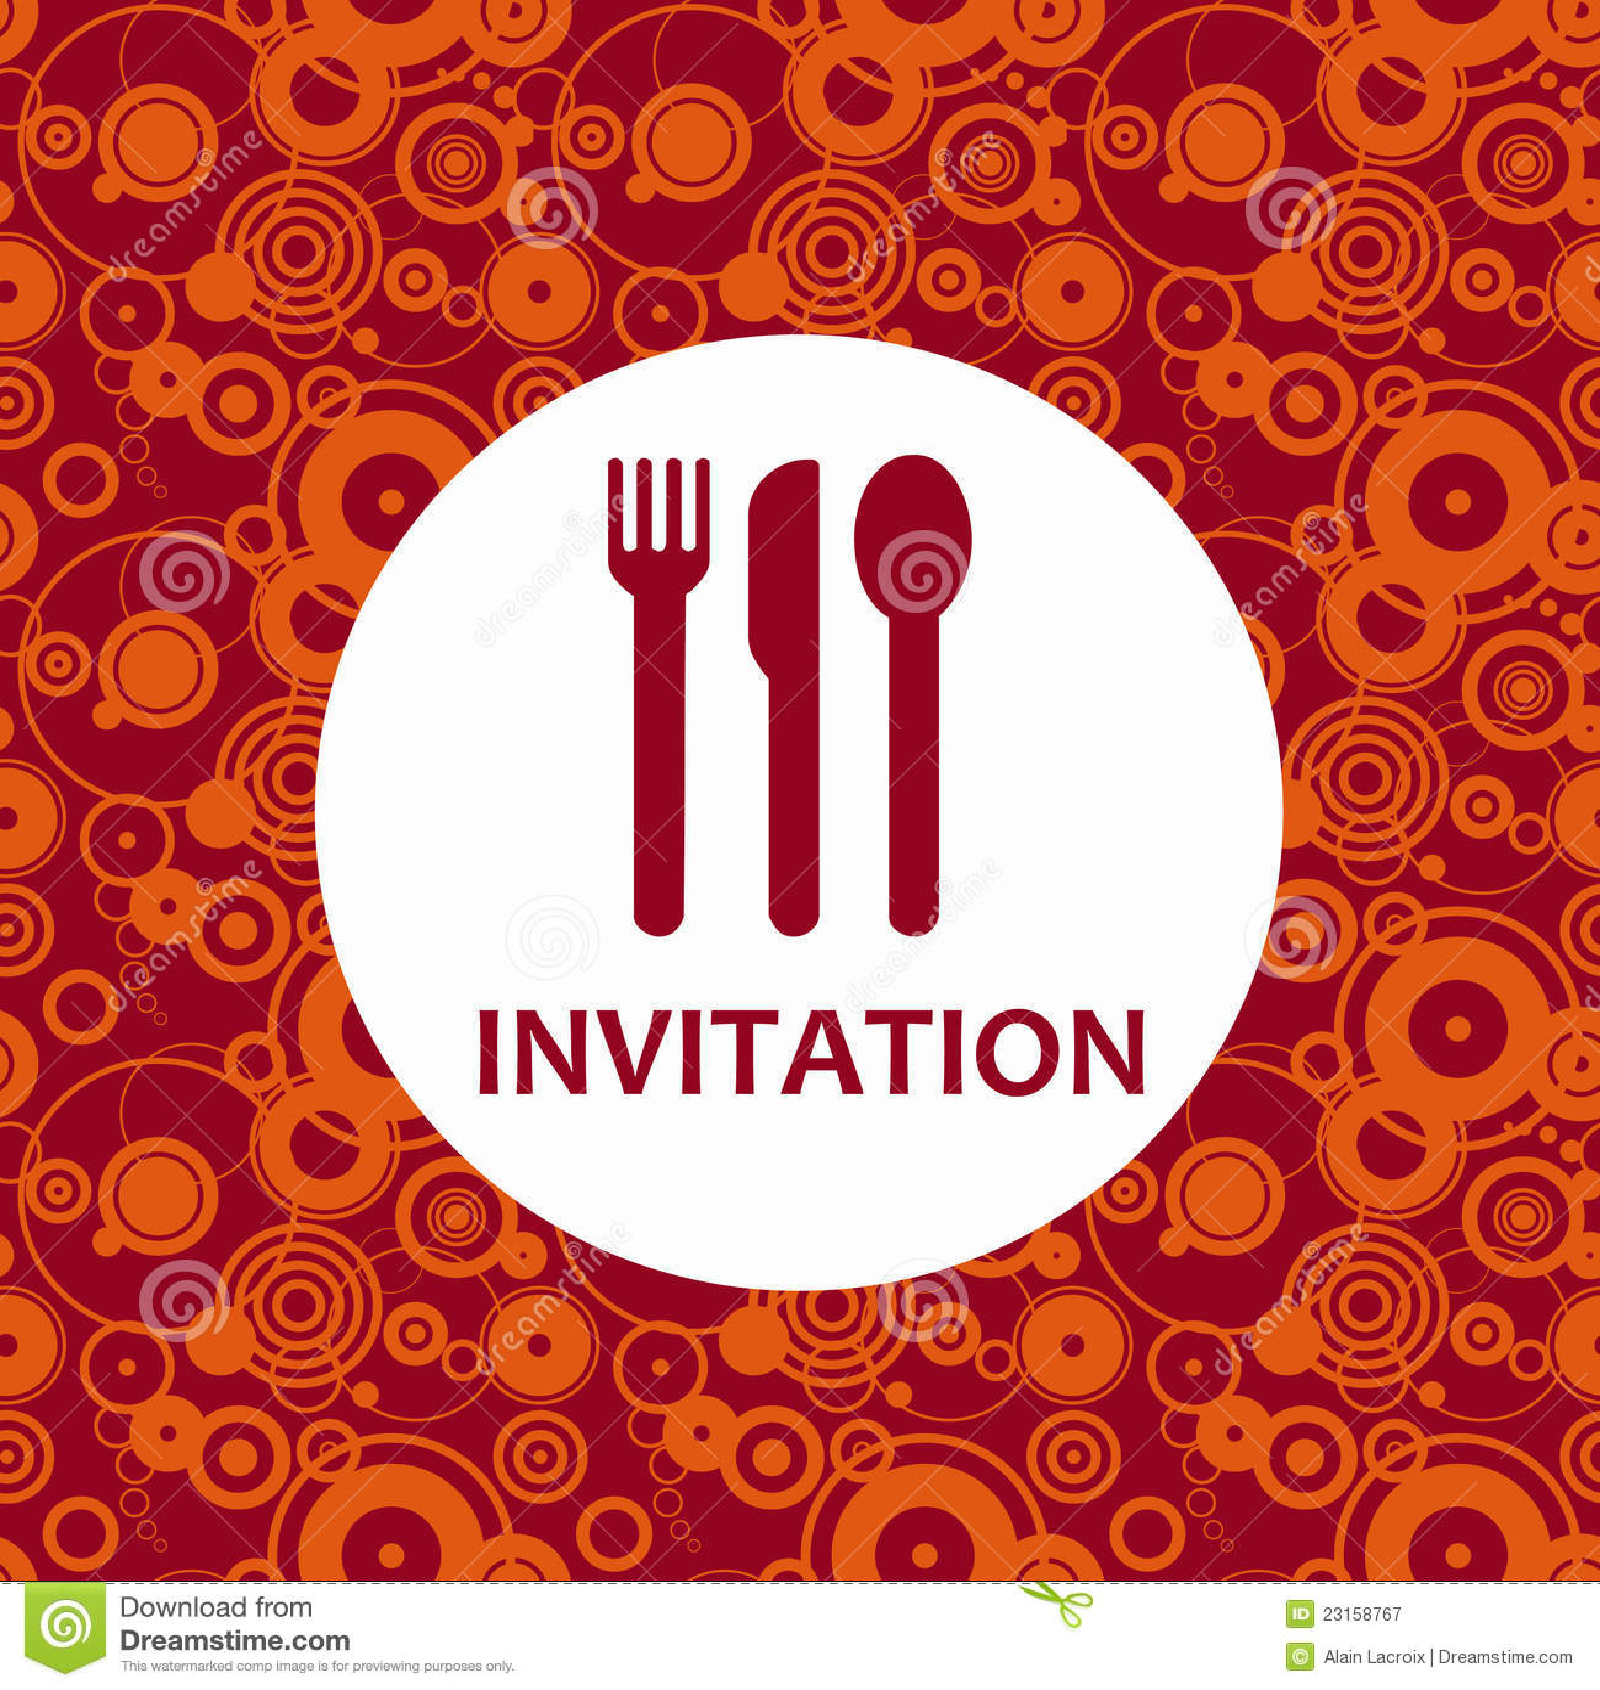 dinner invitation royalty free stock photography